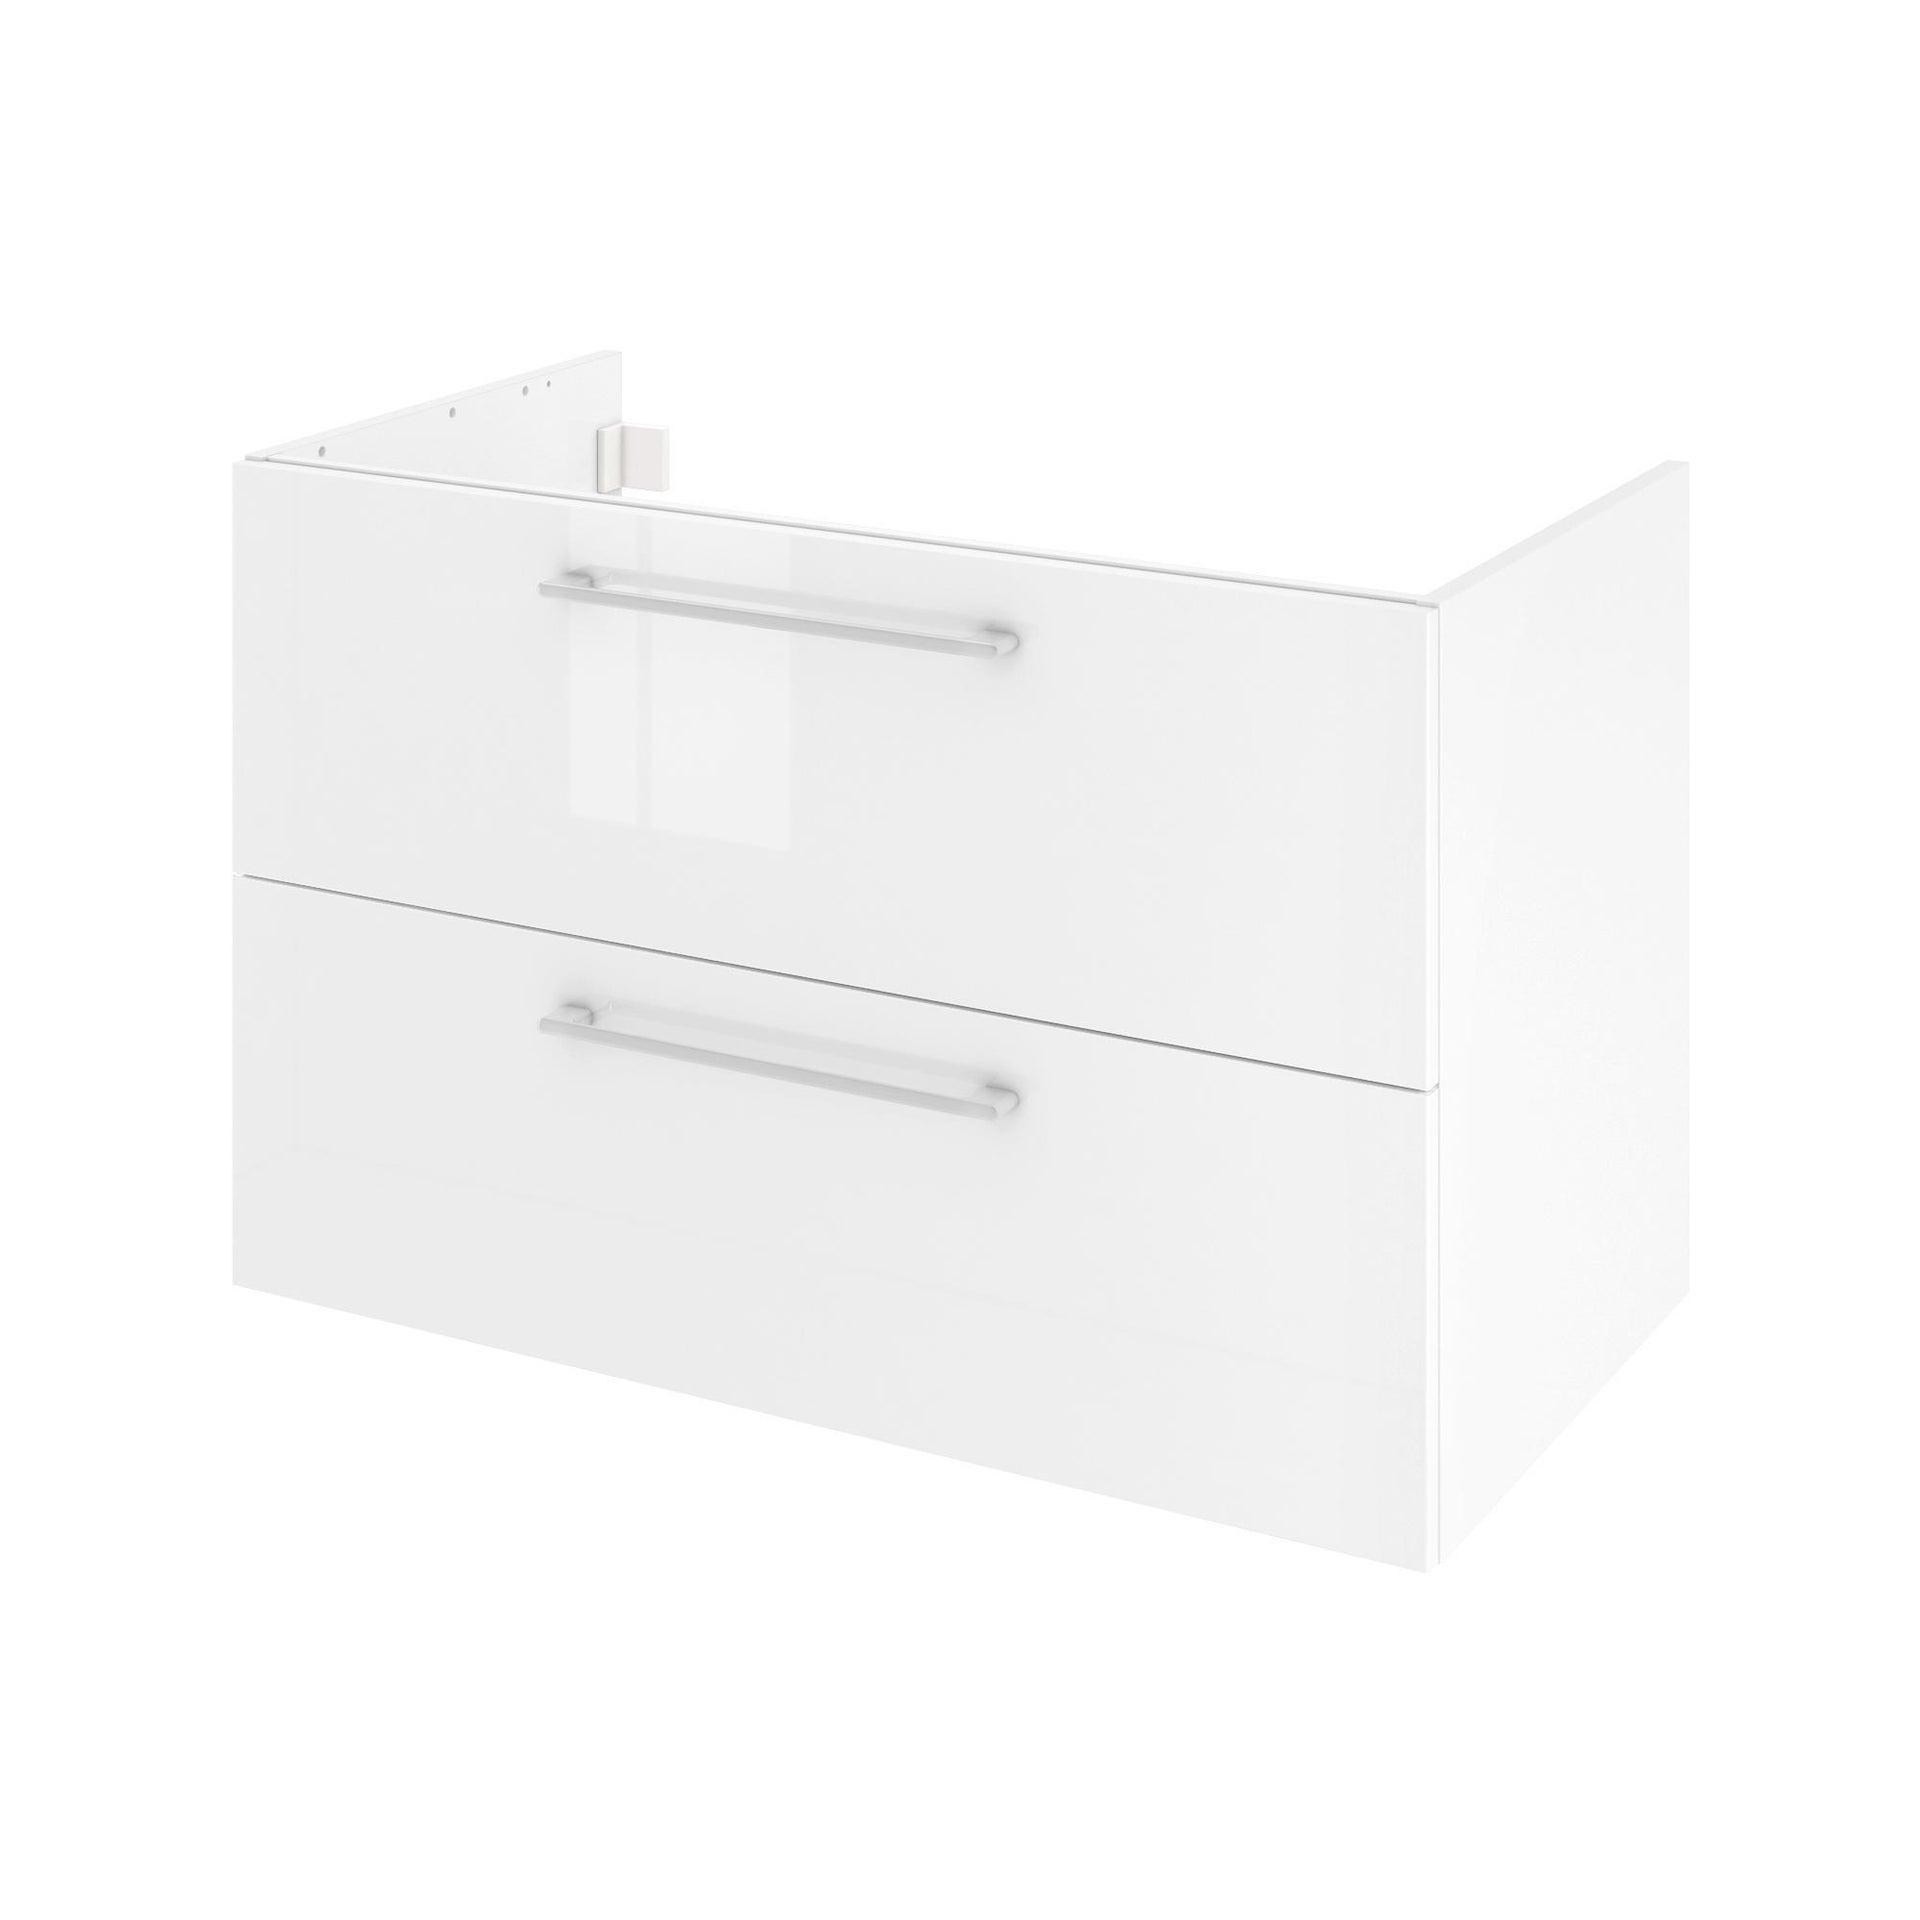 Mobile lavabo L 90 x P 48 x H 58 cm in agglomerato bianco - 1